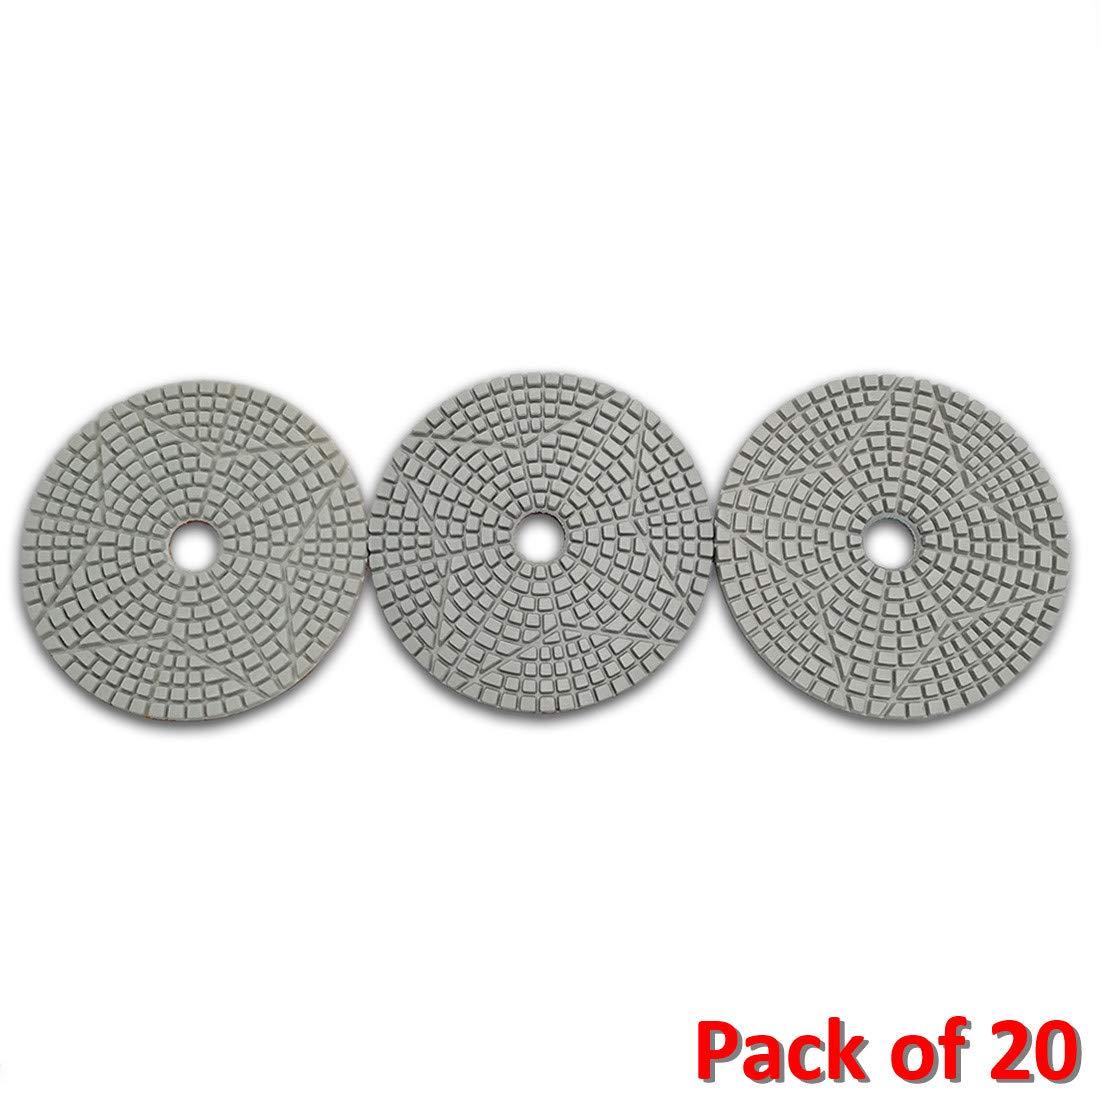 SHDIATOOL 3 Step Diamond Polishing Pads 60PCS Dia 4 inch Premium Resin Bond Sanding Discs for Stone Marble